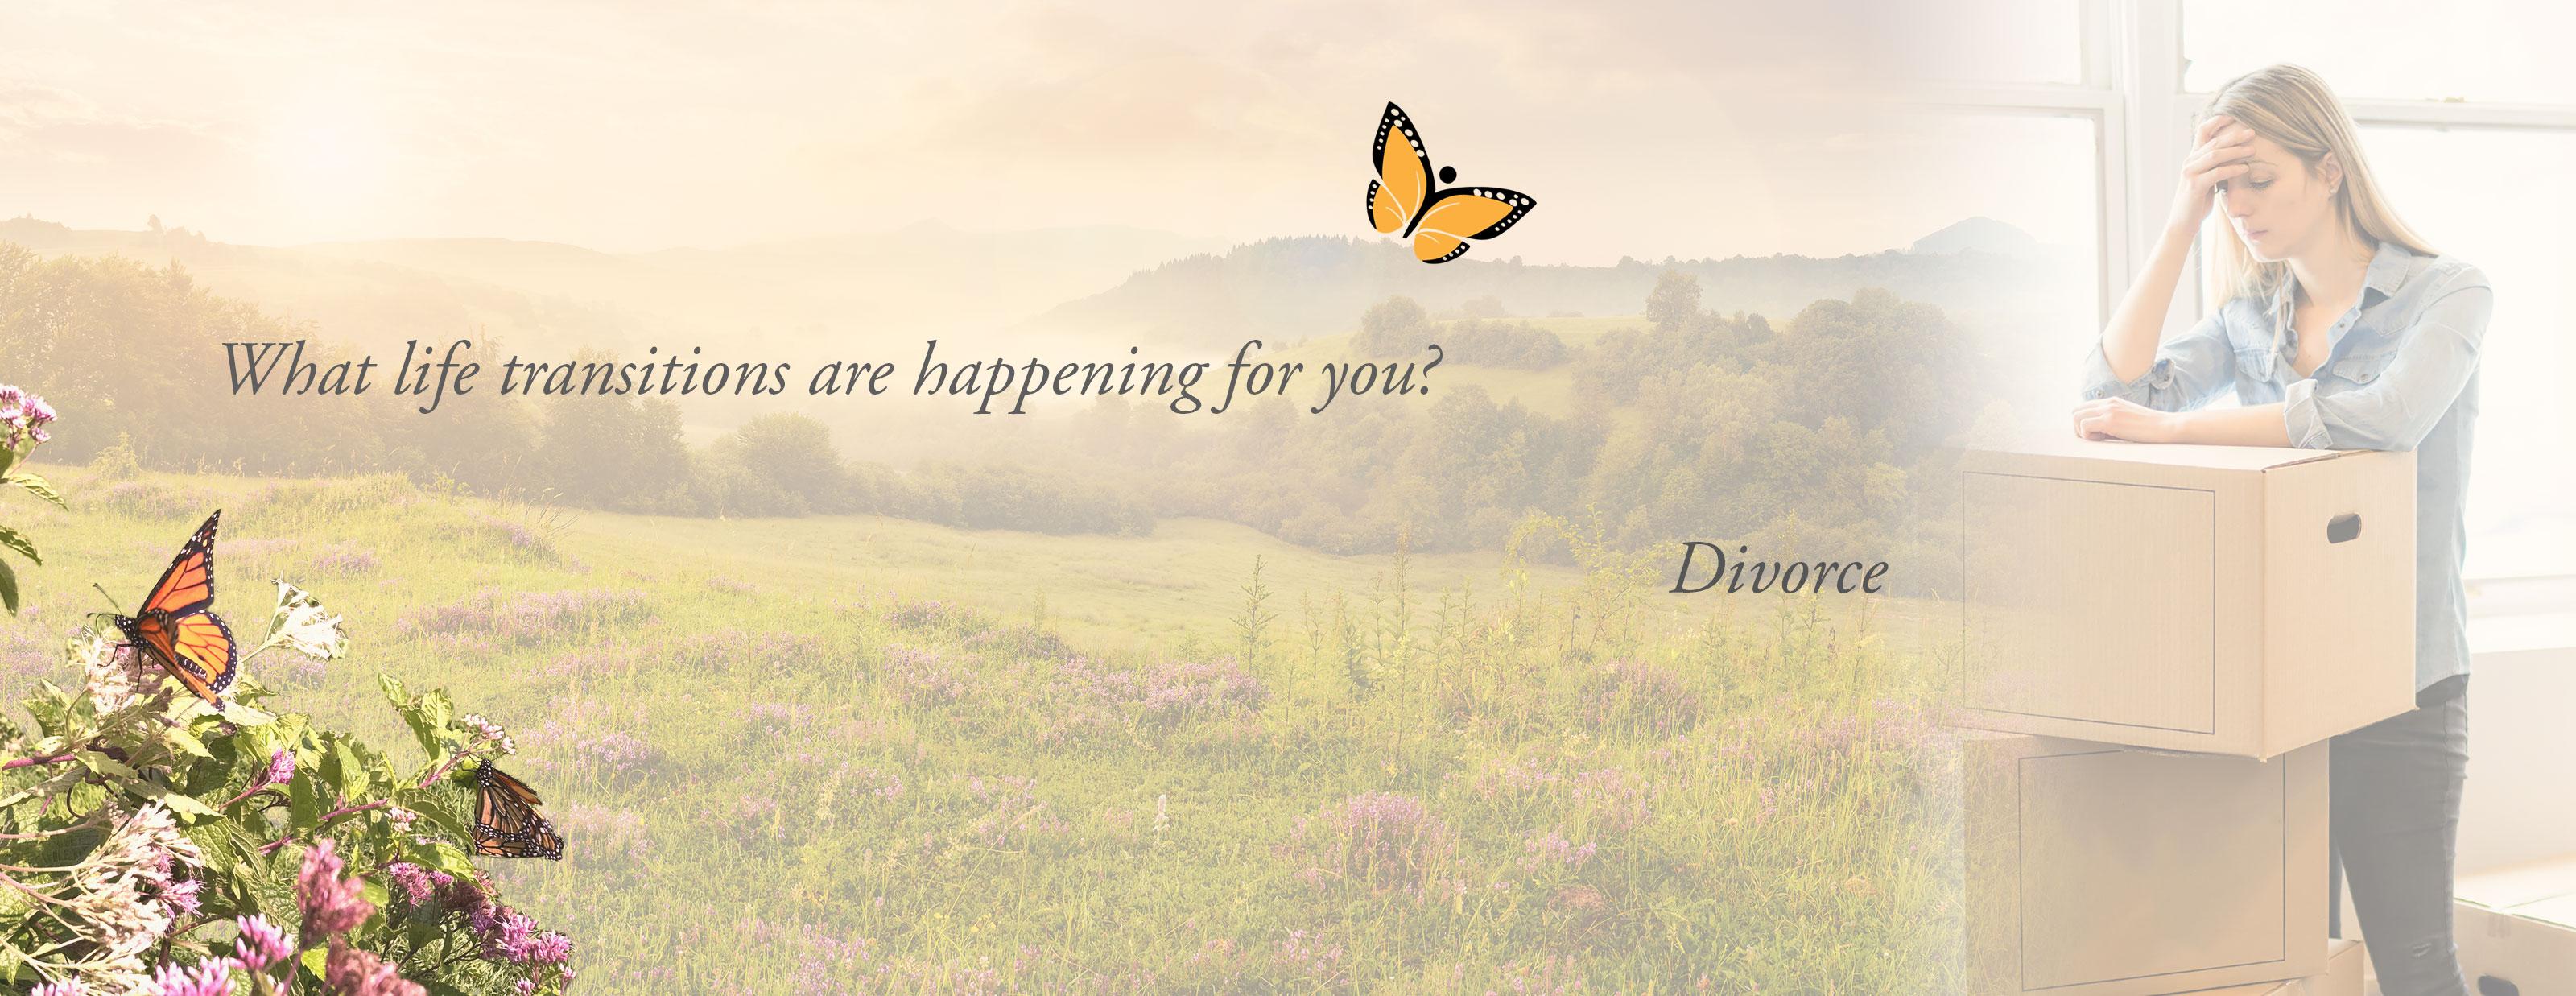 Life transitions - Divorce | Life transitions Divorce transition Relationship breakup Transformation Life transformation Transformation process